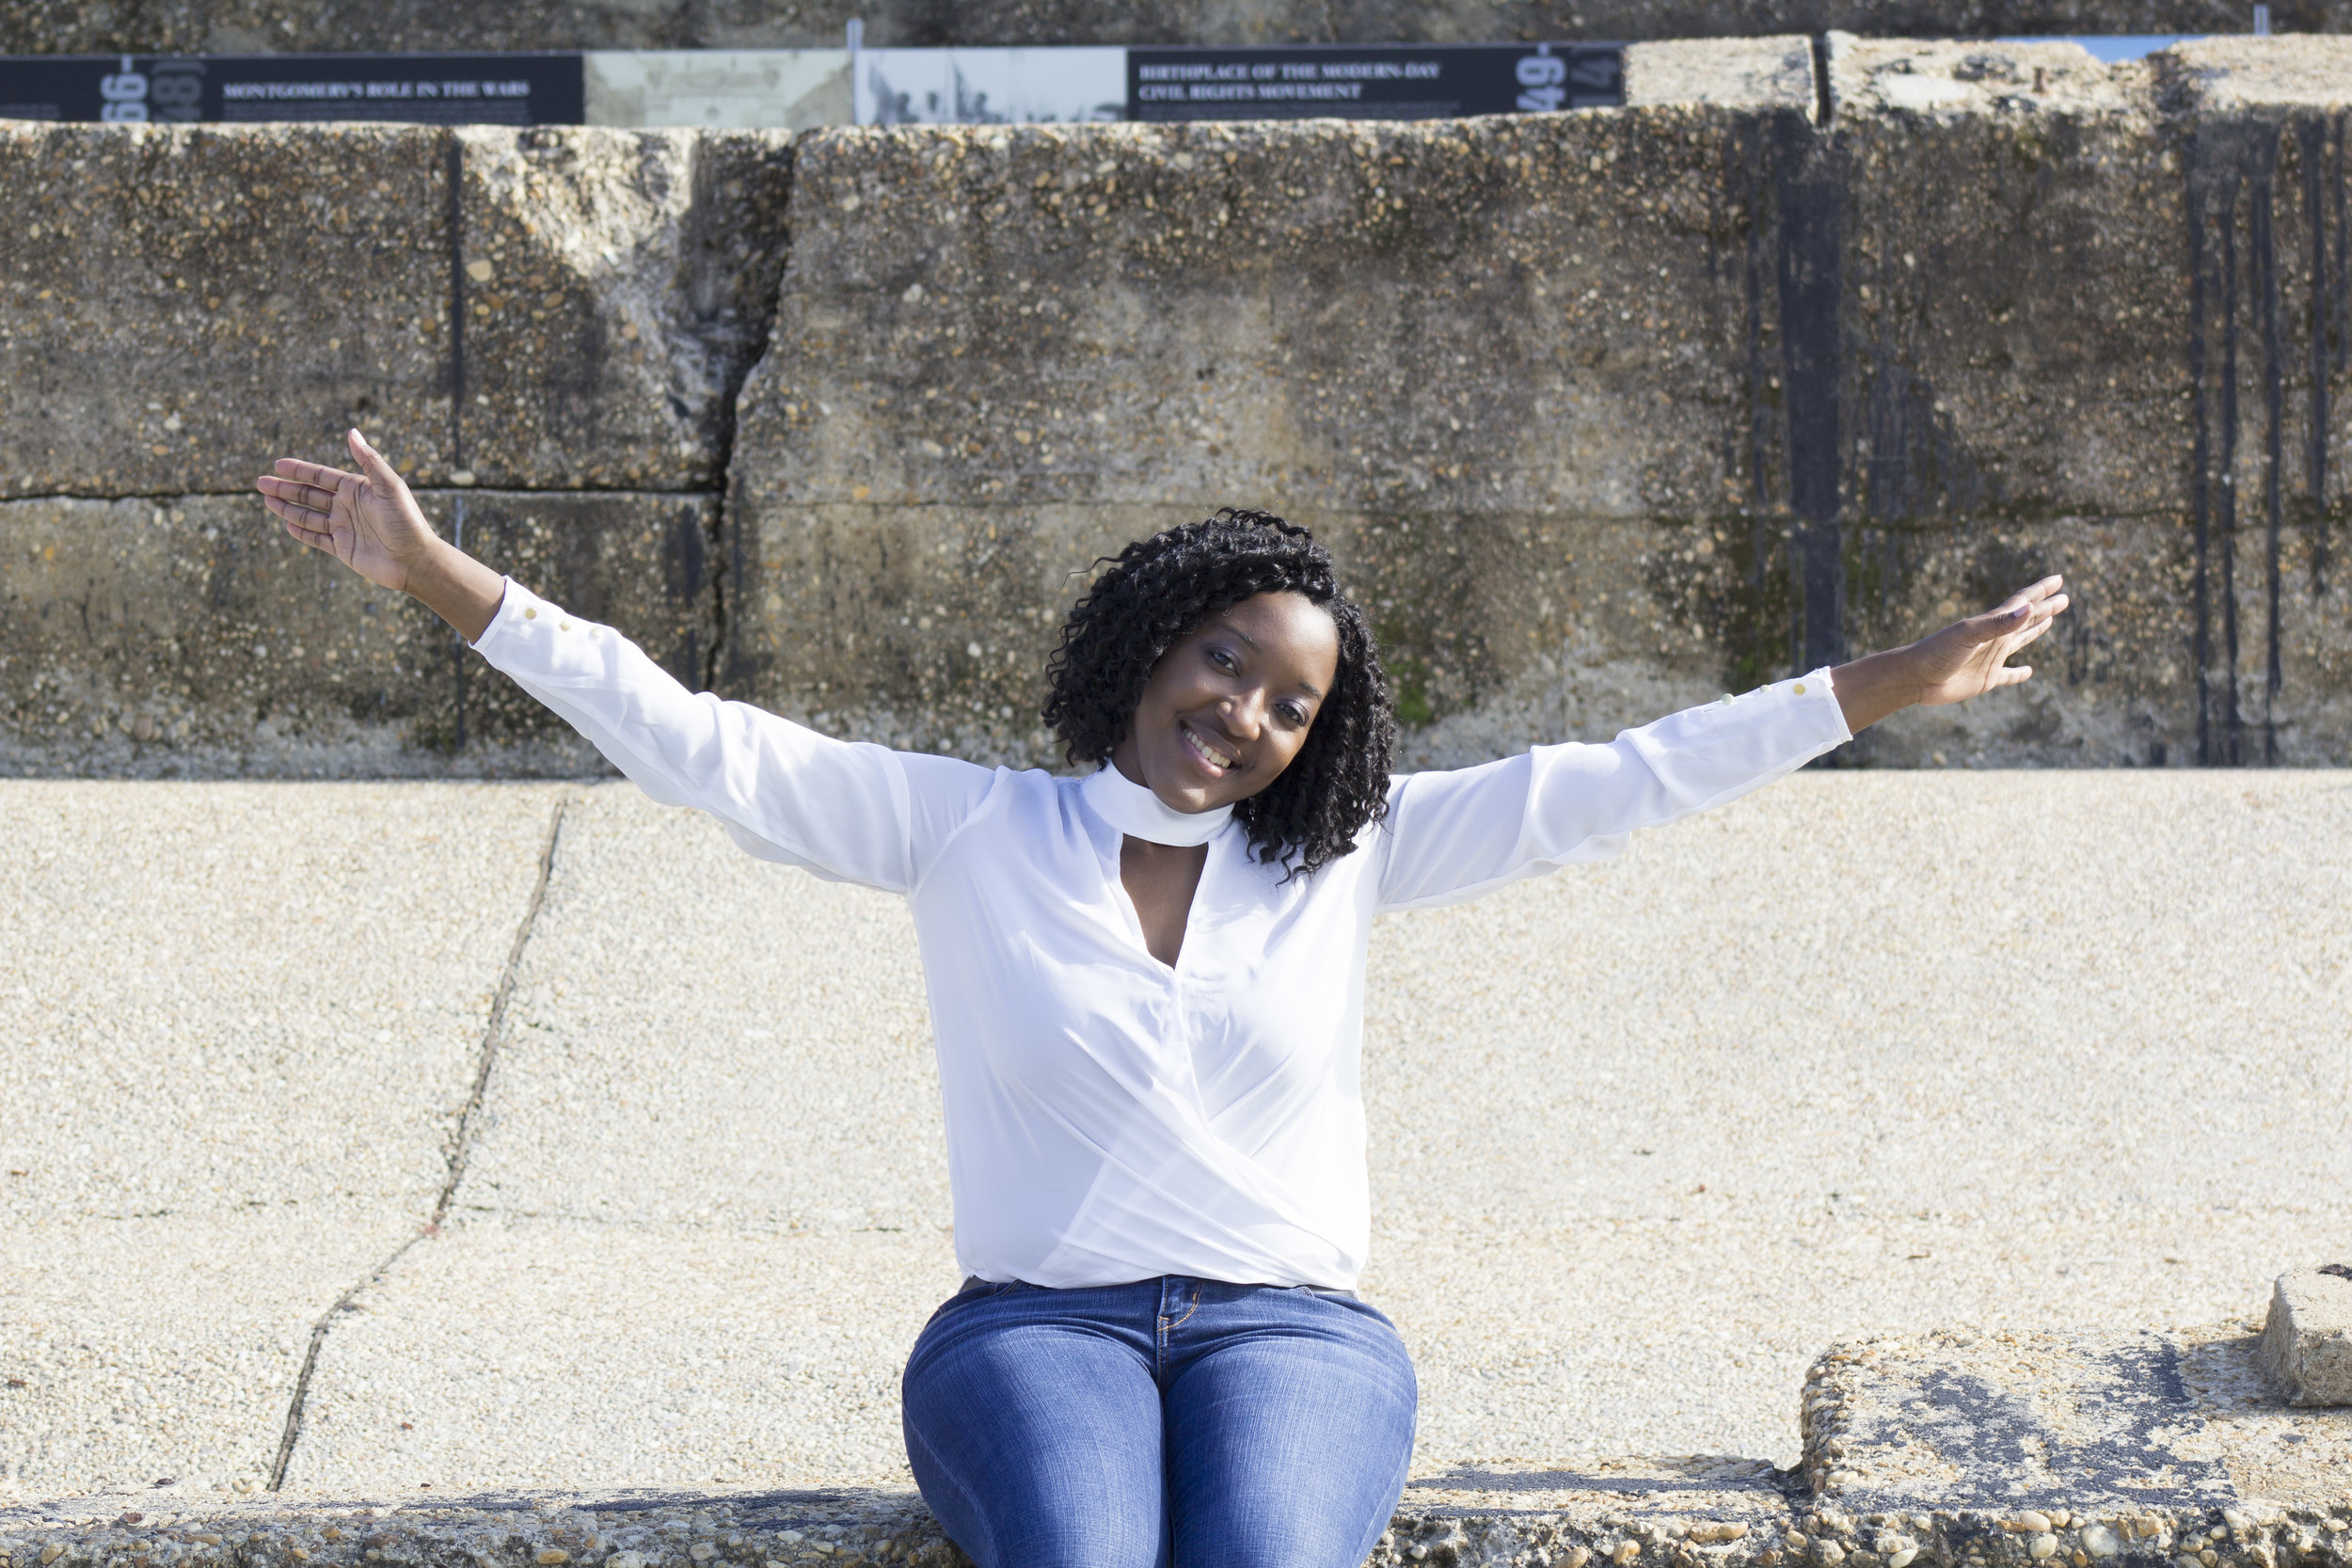 Myrtice Carter,Career Coach for Millennials - Phone: 334.377.0021Email: myrtice@myrticecarter.comFollow on Facebook | Instagram @themyrticecarterJoin Free Facebook Group: Motivating Ordinary Millennials